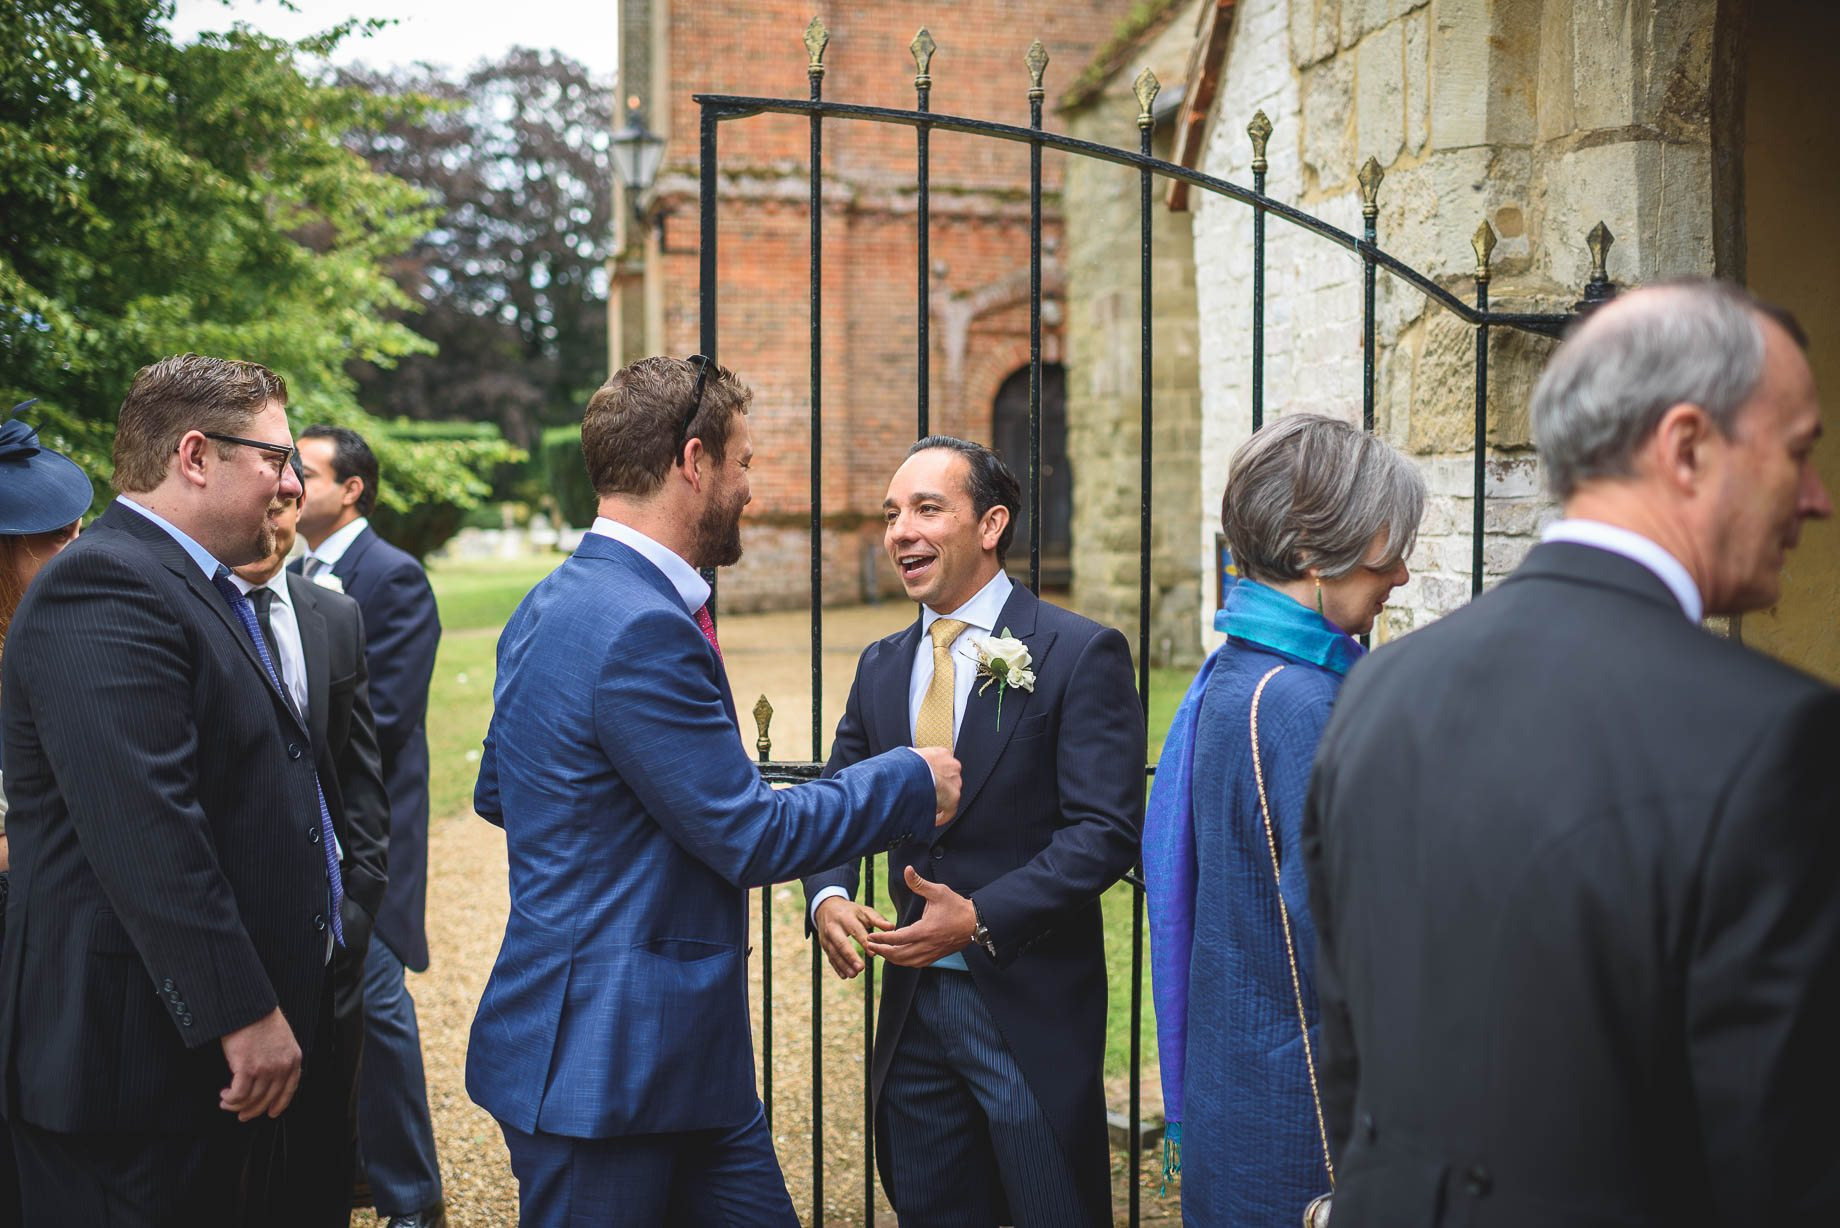 Bury Court Barn Wedding Photography - Caroline and Rob (31 of 219)